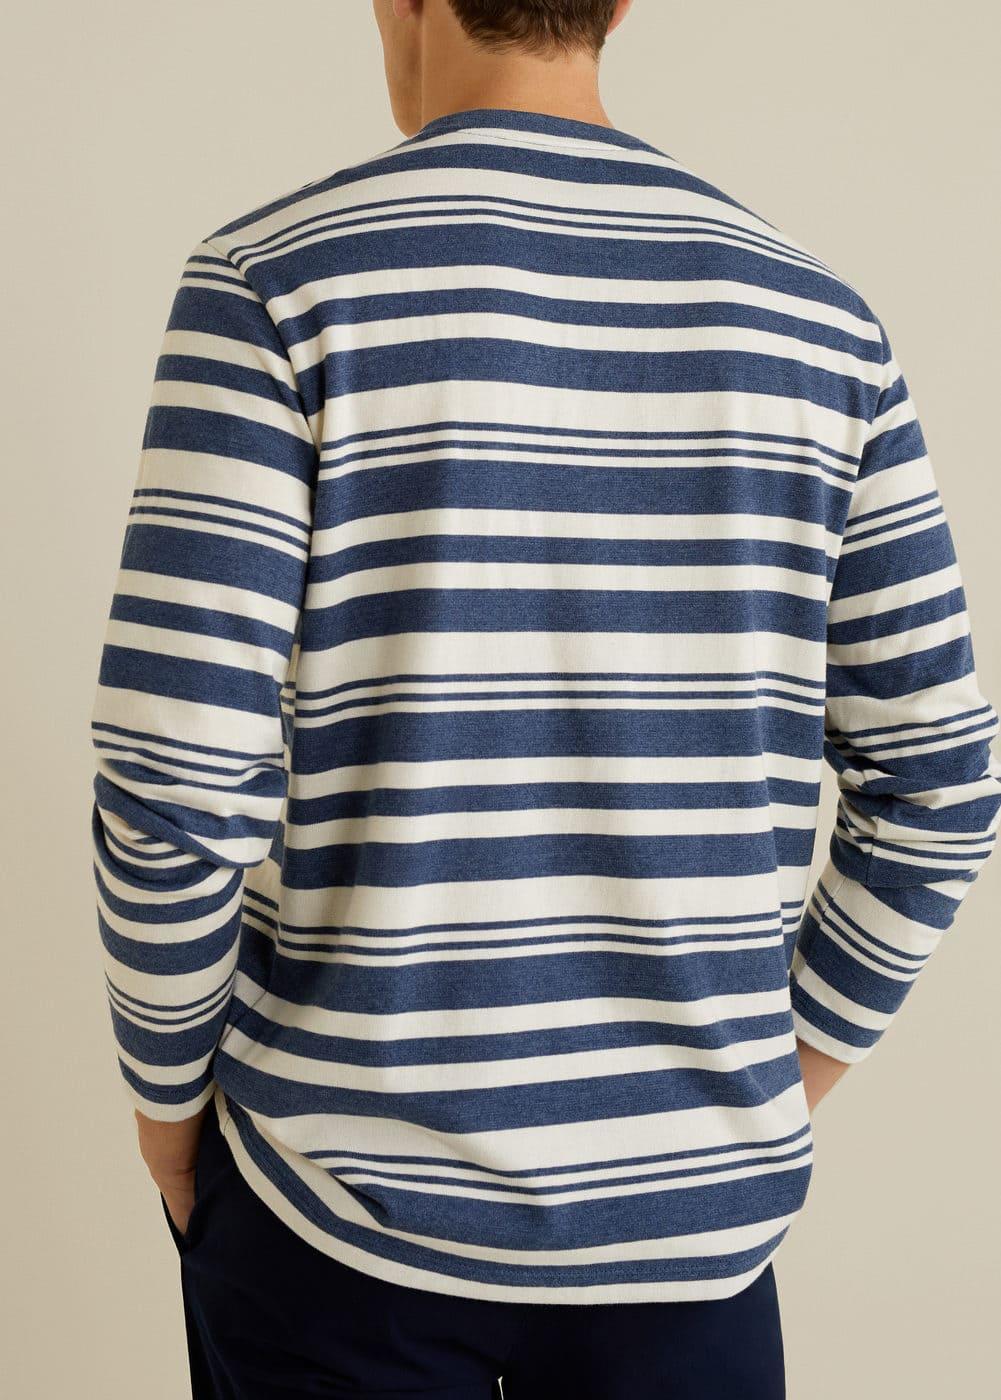 Mango - Camiseta algodón rayas - 3